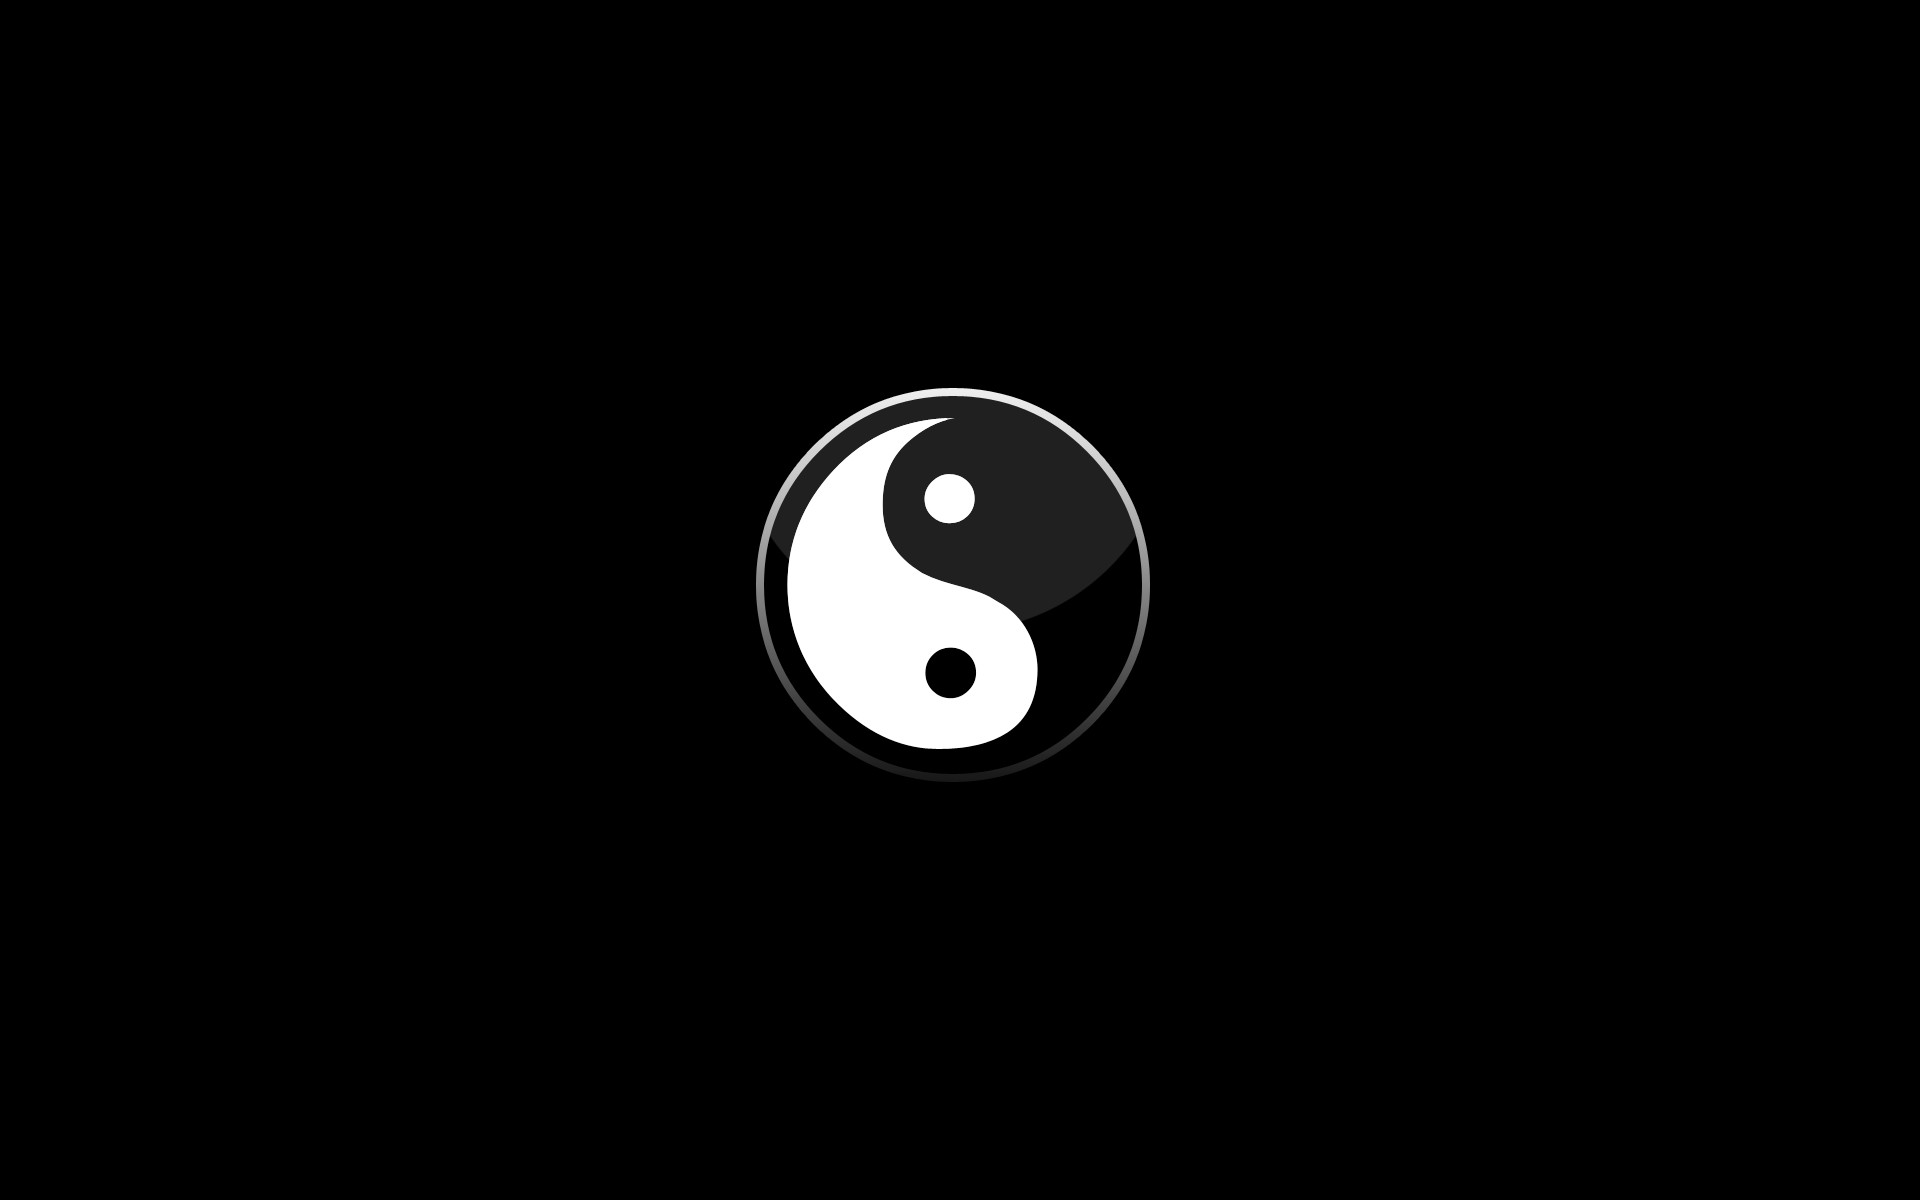 Yin Yang wallpaper ·① Download free amazing backgrounds ...